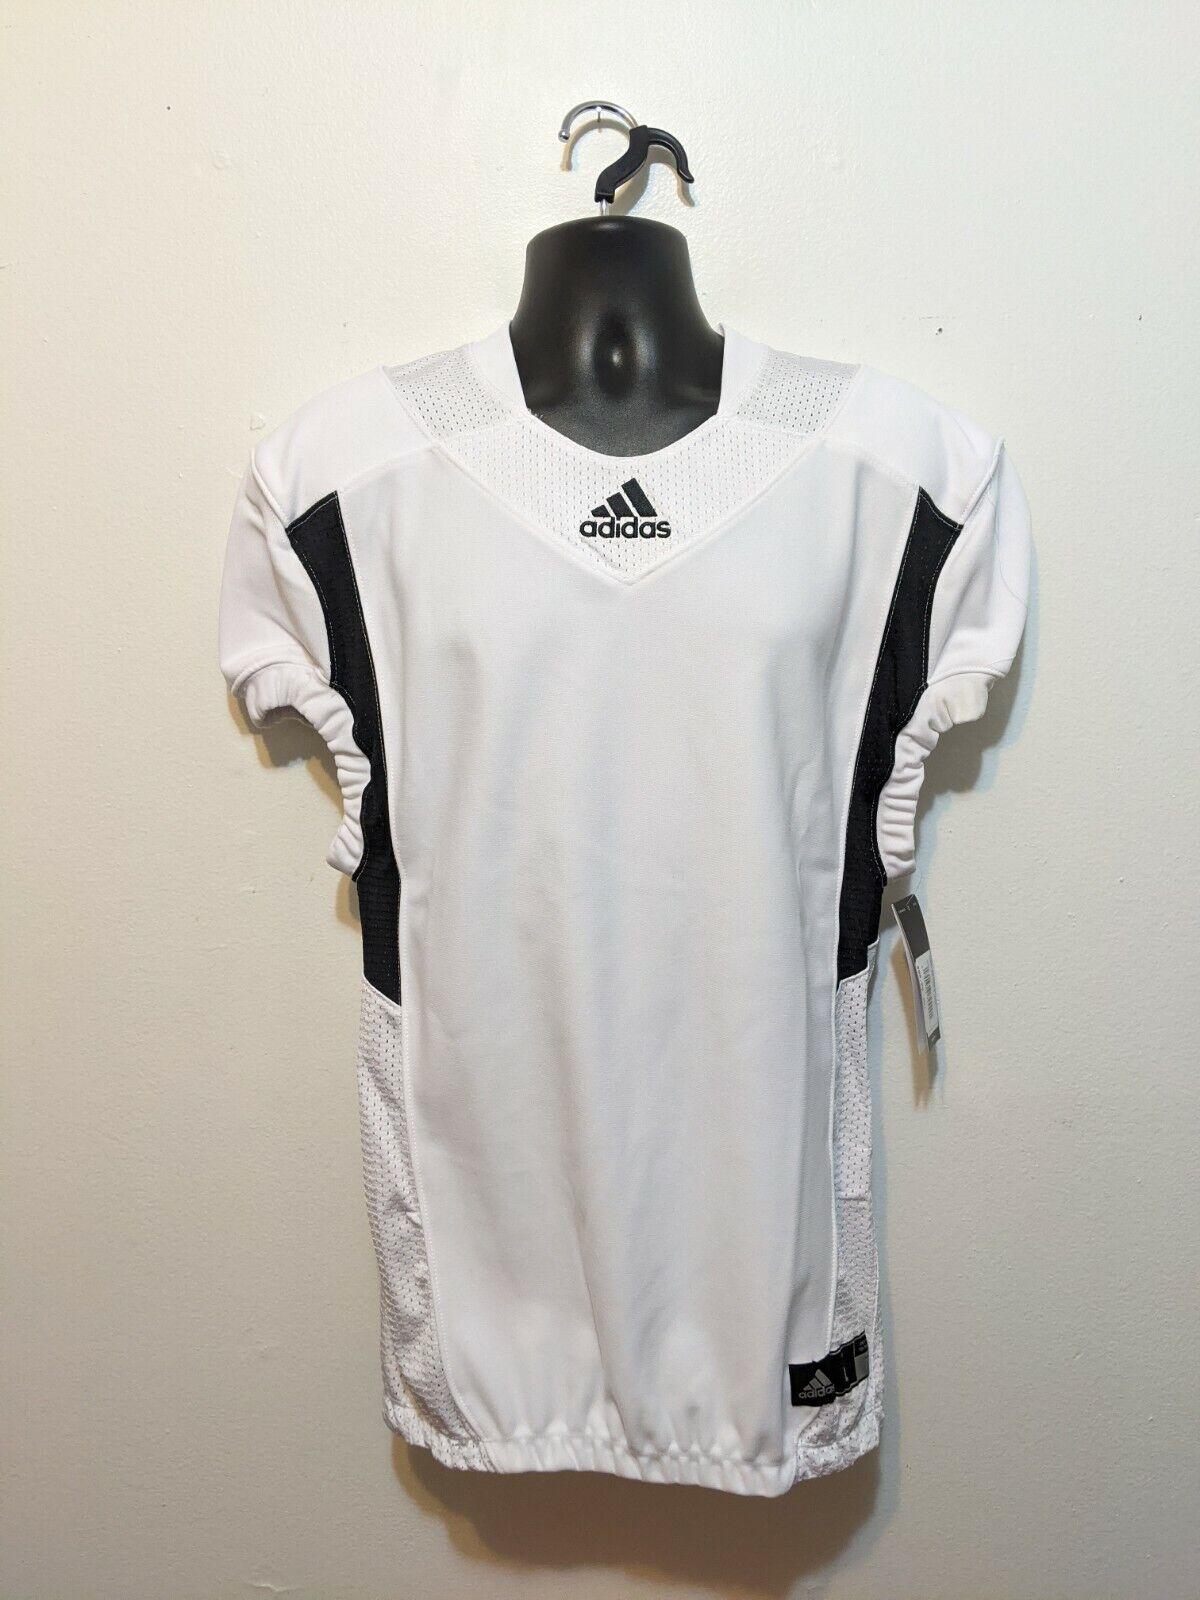 Adidas Techfit Hyped Football Jersey White/Black AZ9291 Men's Size Large NWT